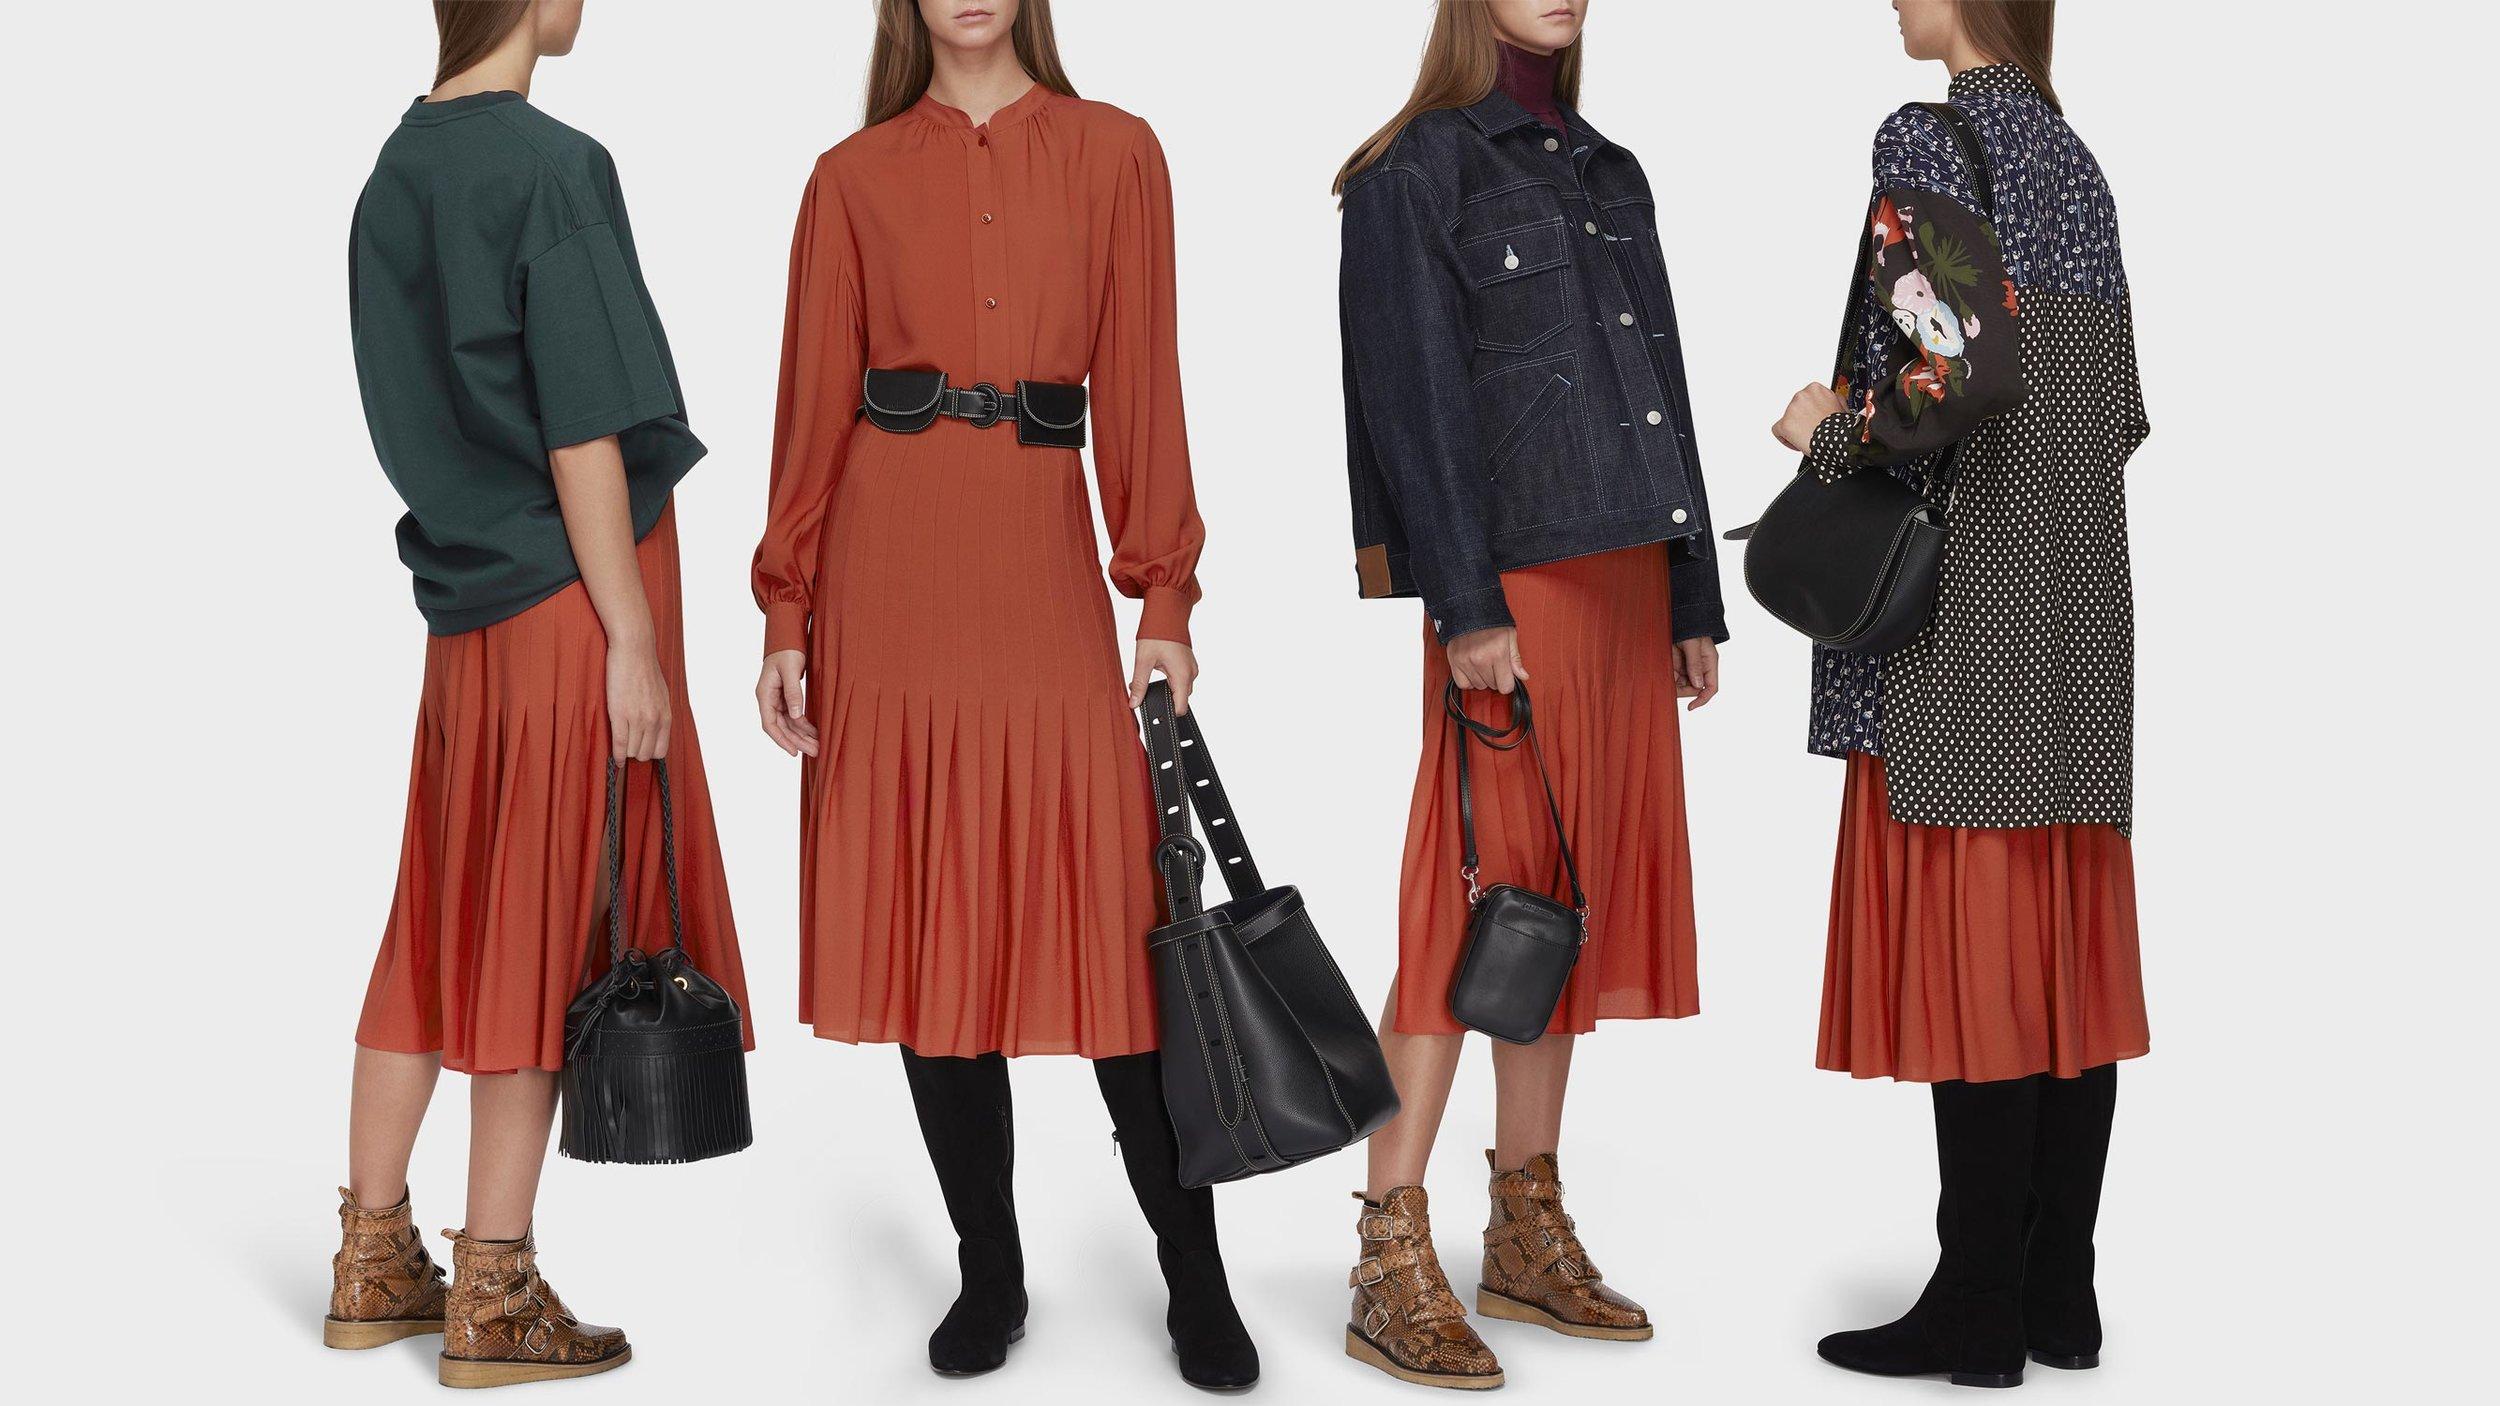 Womenswear-model-ecommerce-photography.jpg